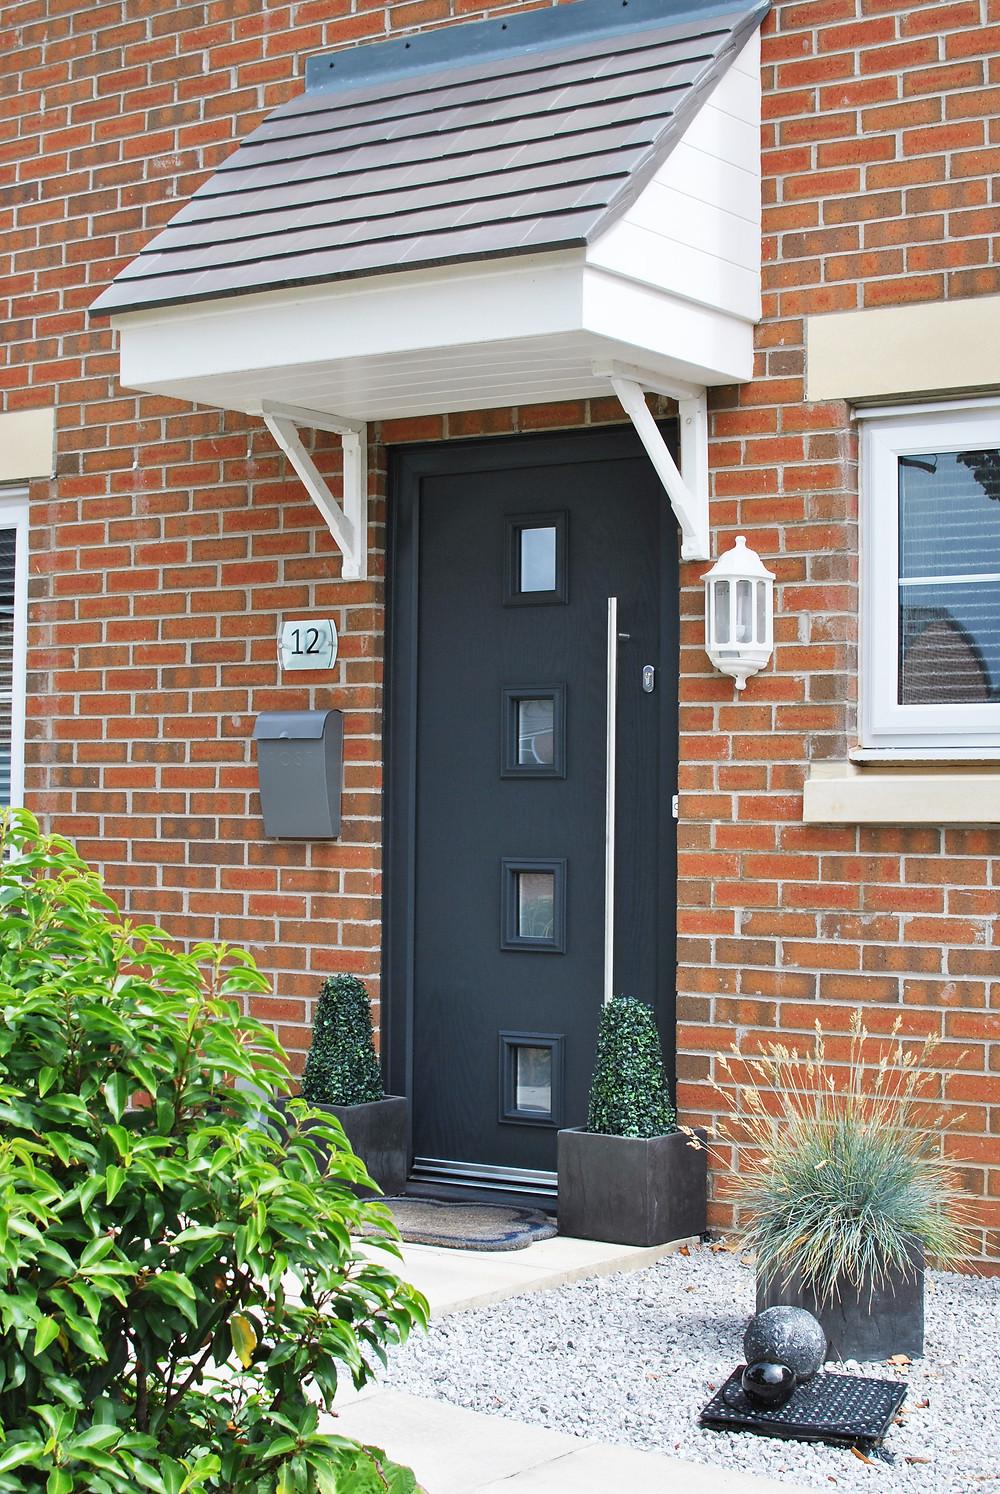 Modern Anthracite Grey Composite Door with Bar Handle